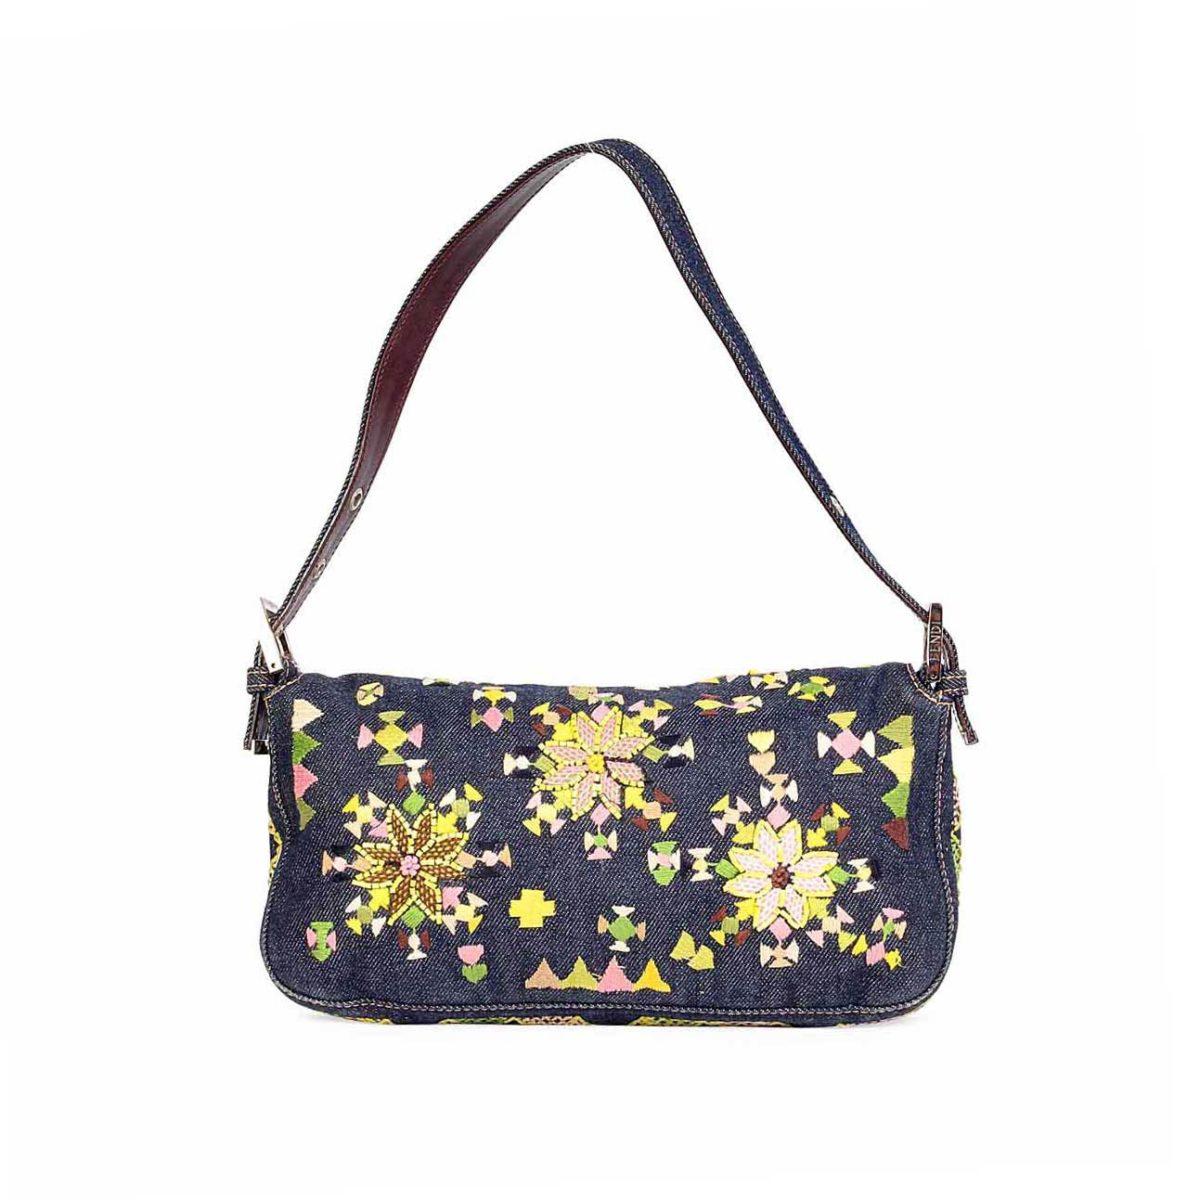 a312f0de57 FENDI Denim Baguette with Floral Embroidery   Beads